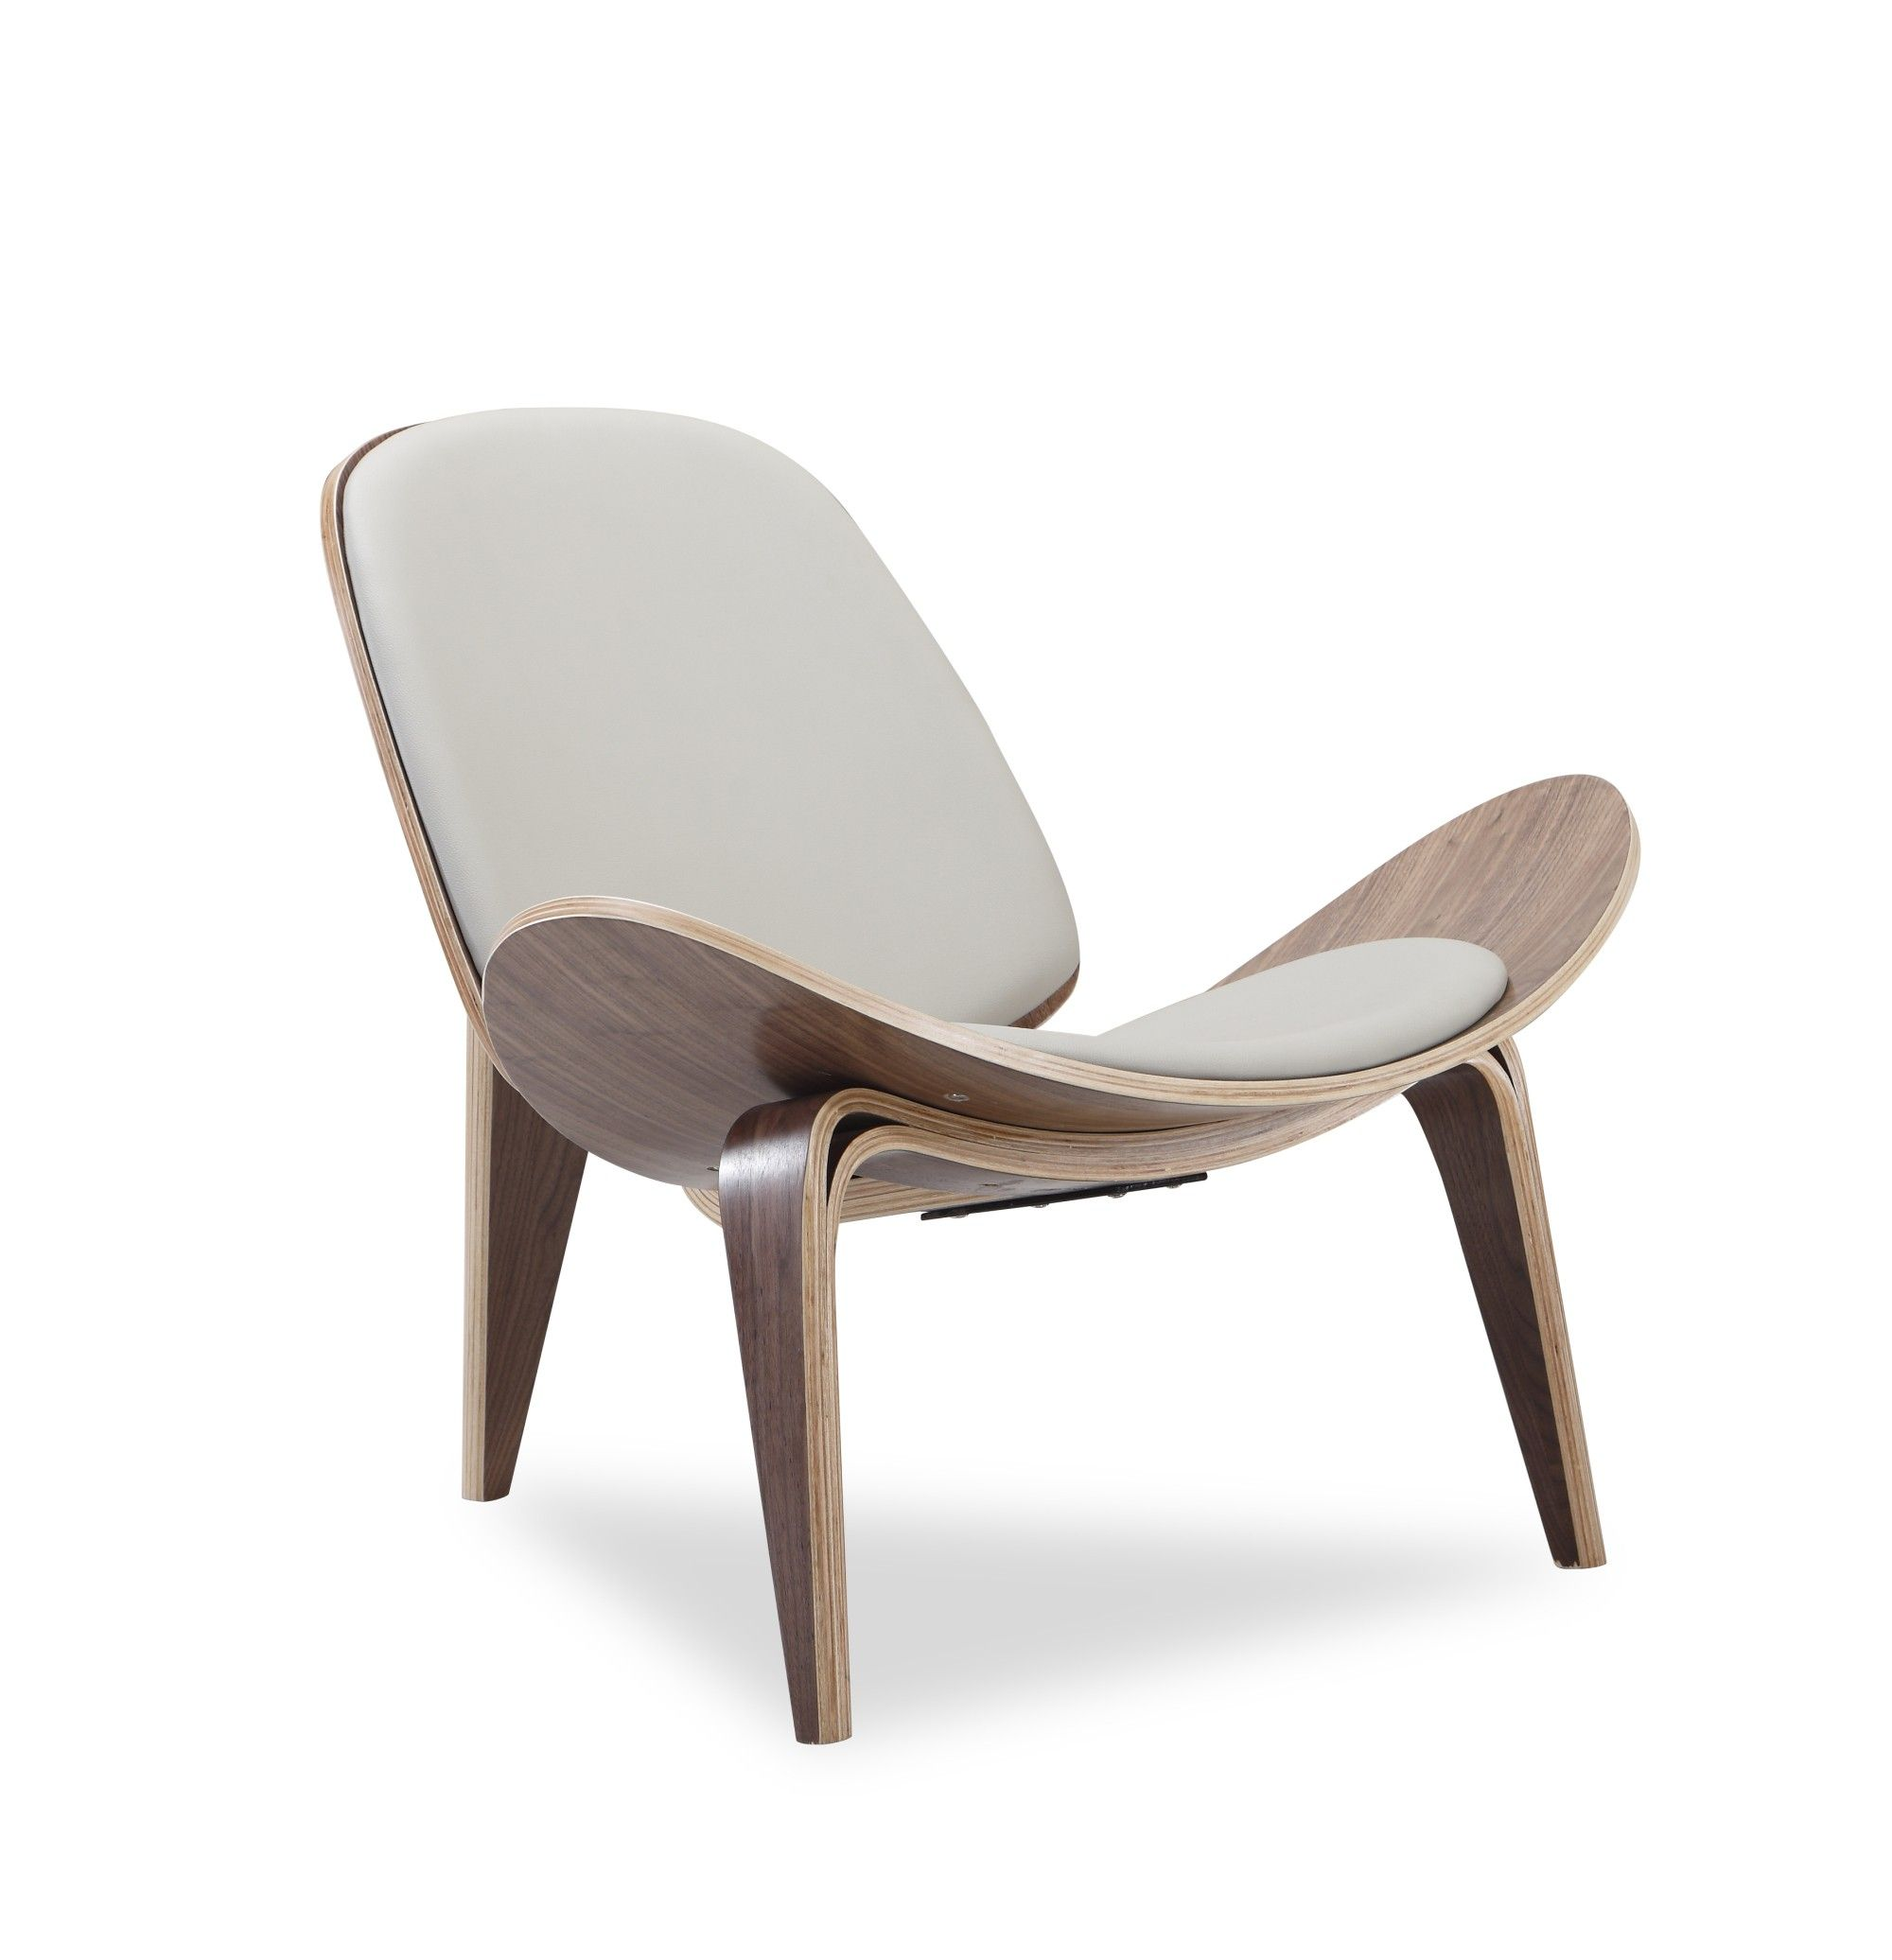 Grau Chaise Lounge Sessel Zero Gravity Lounge Stuhl Outdoor Lounge